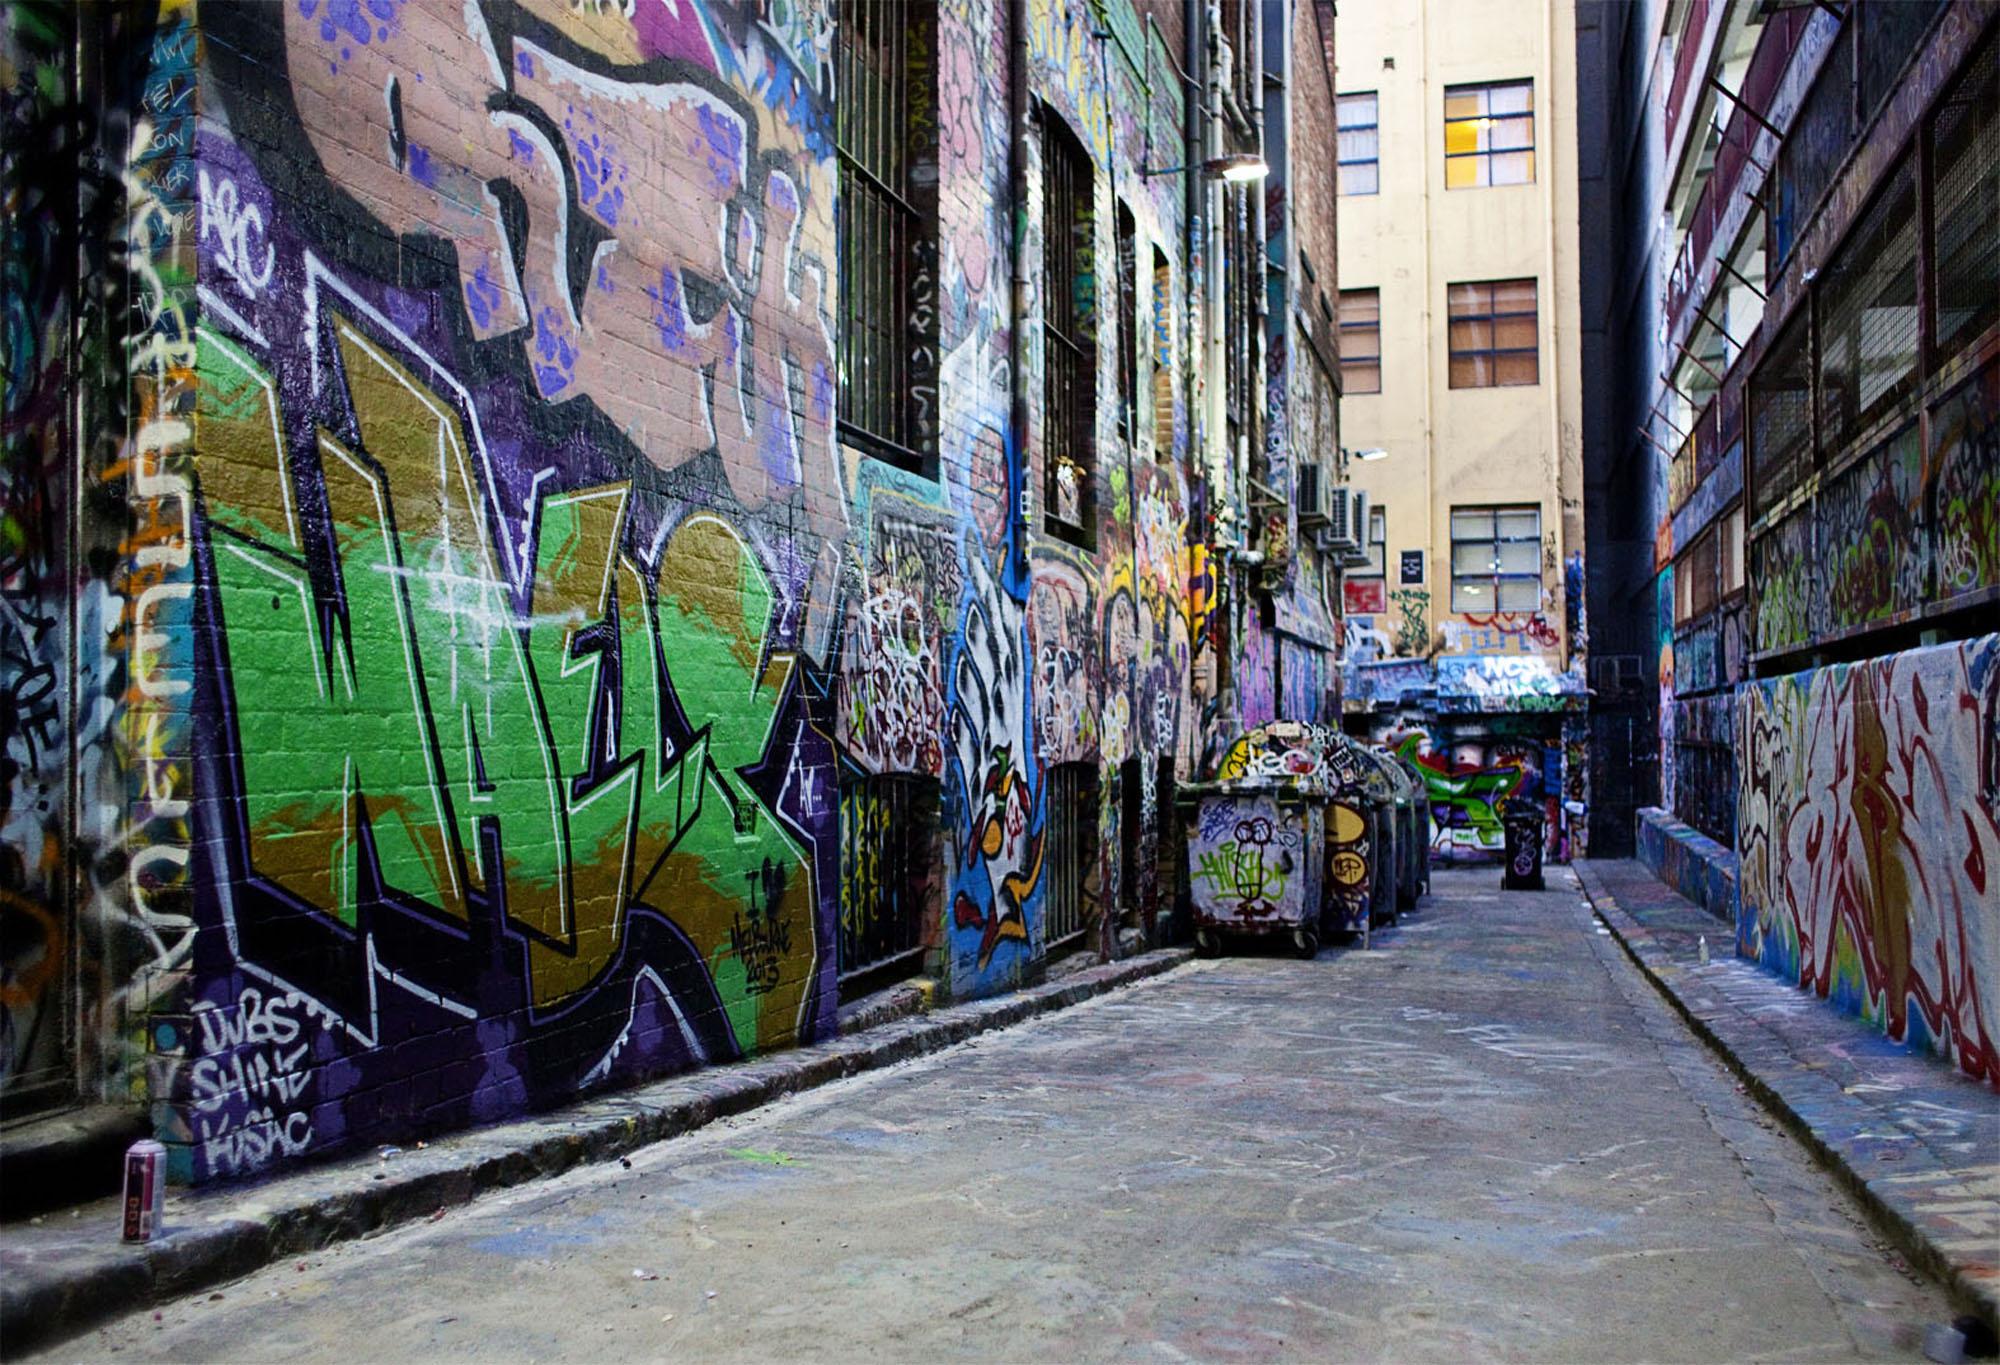 Graffiti in melbournes laneways